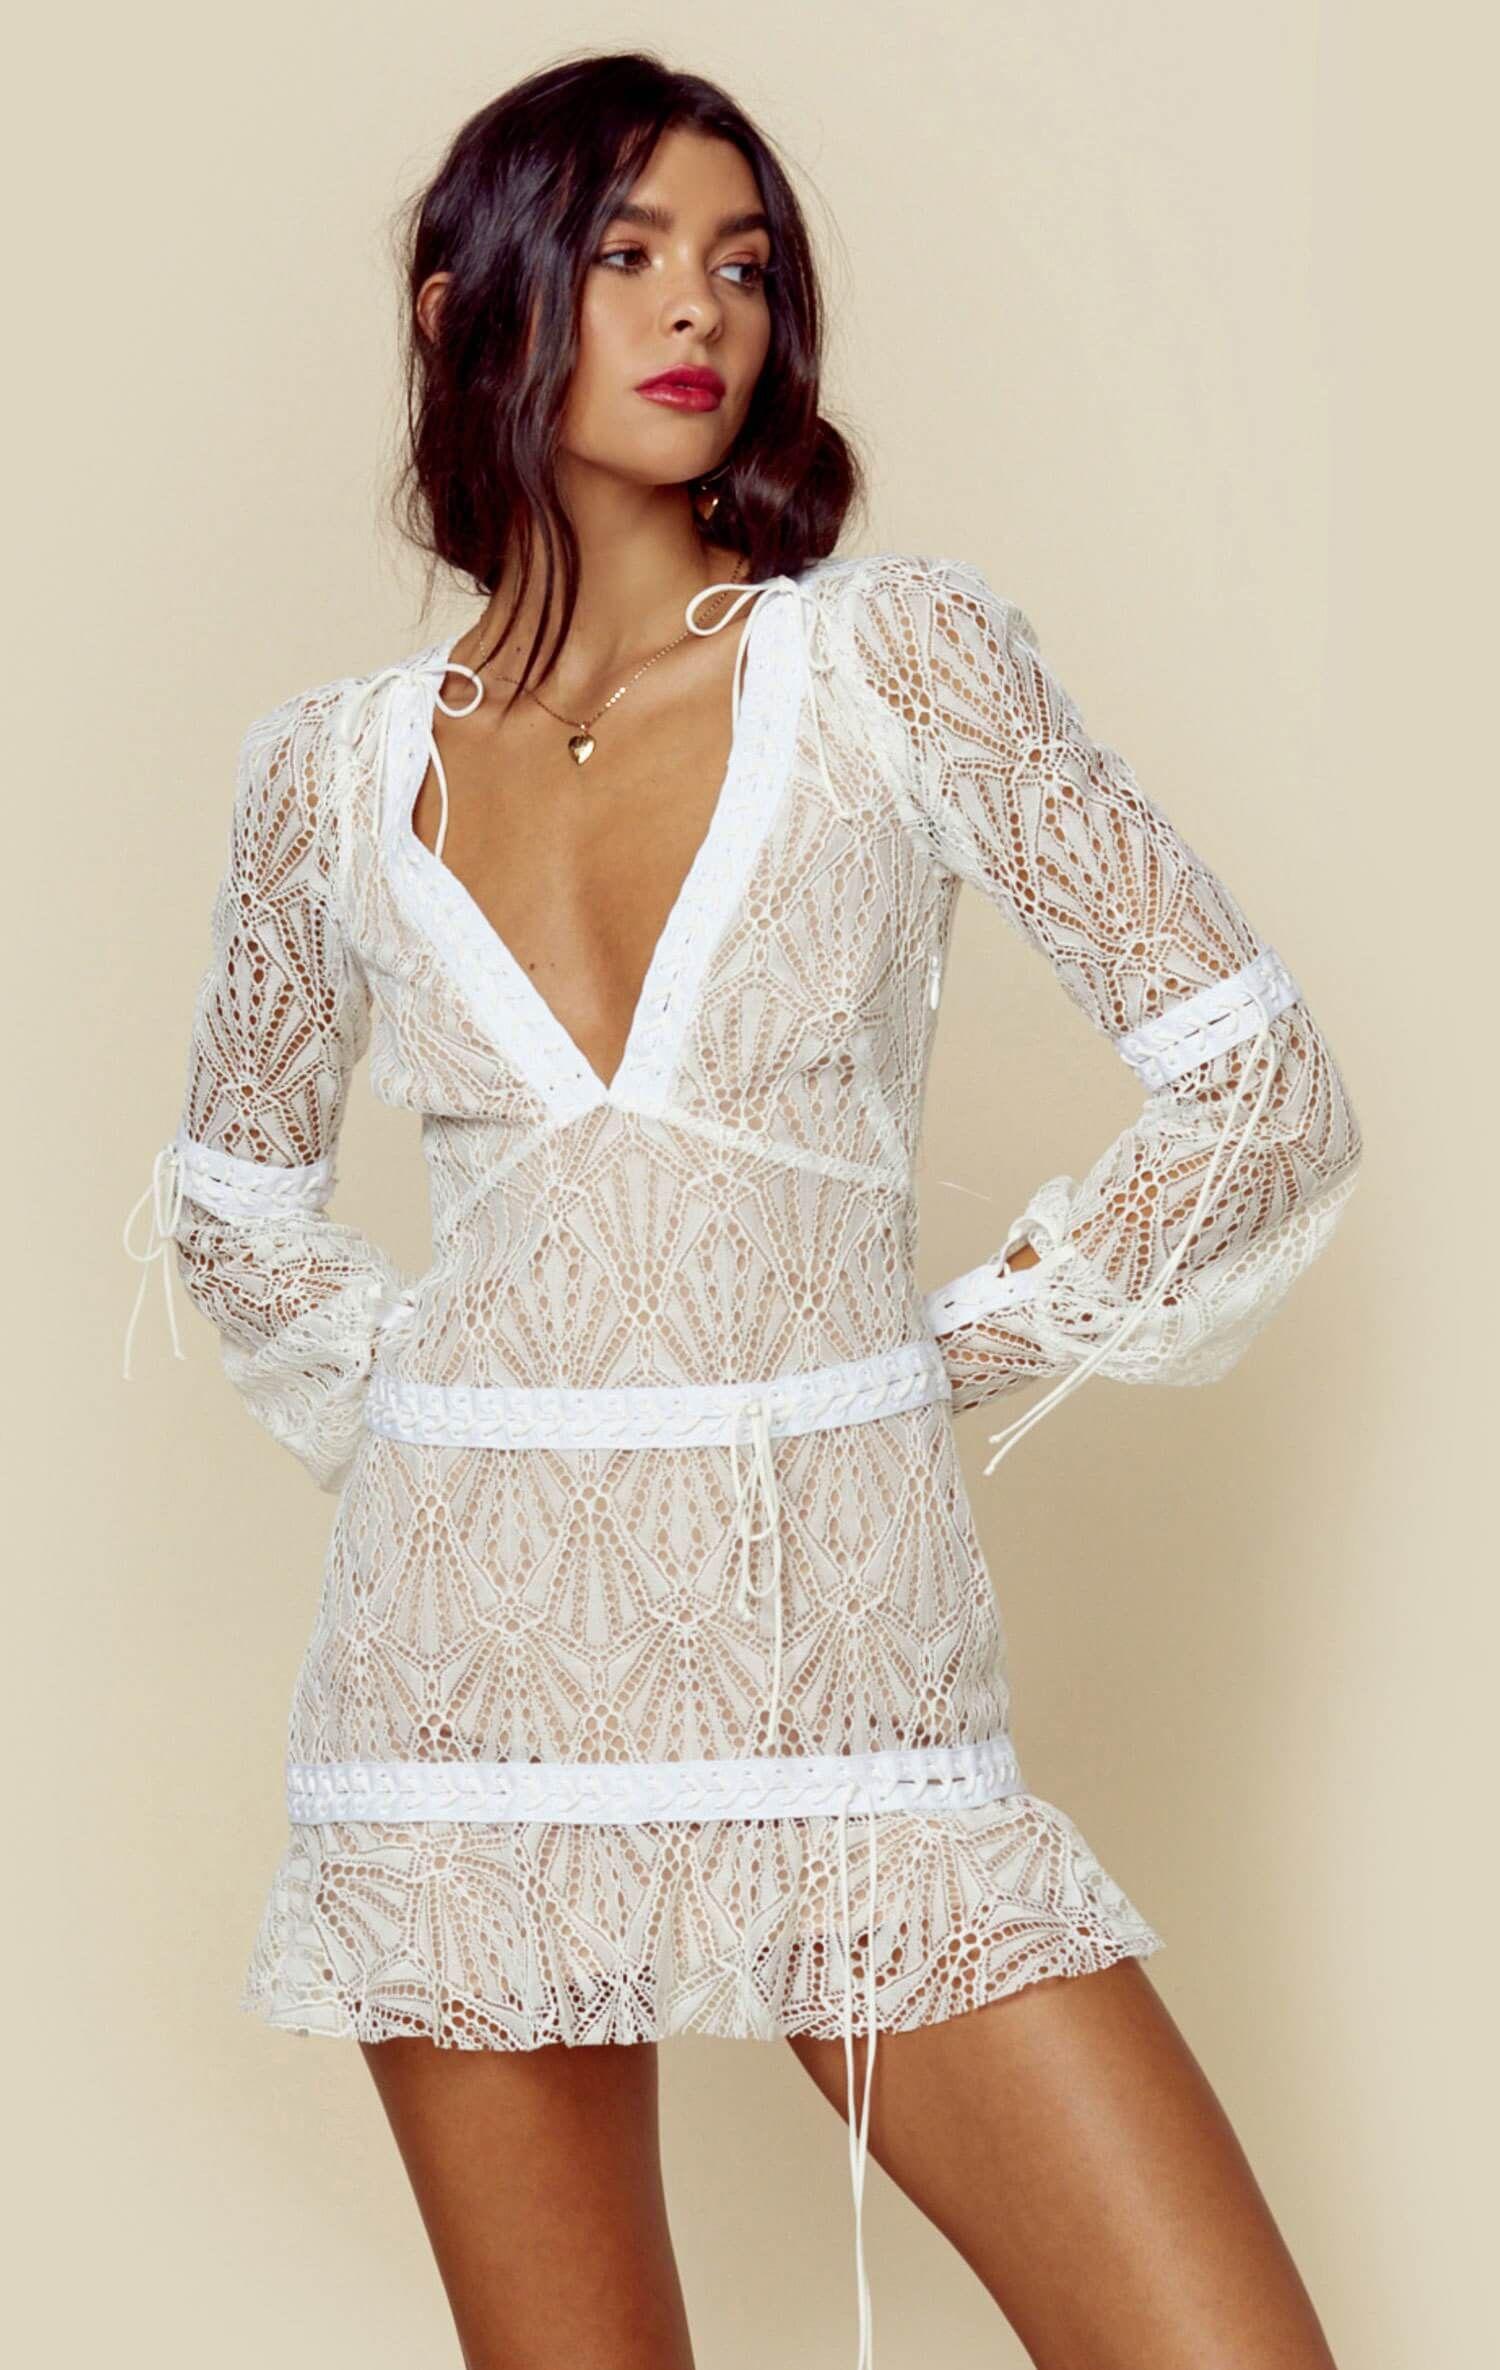 64f400ac7d Bright lights mini dress | clothing | Dresses, Fashion, Boho beach style